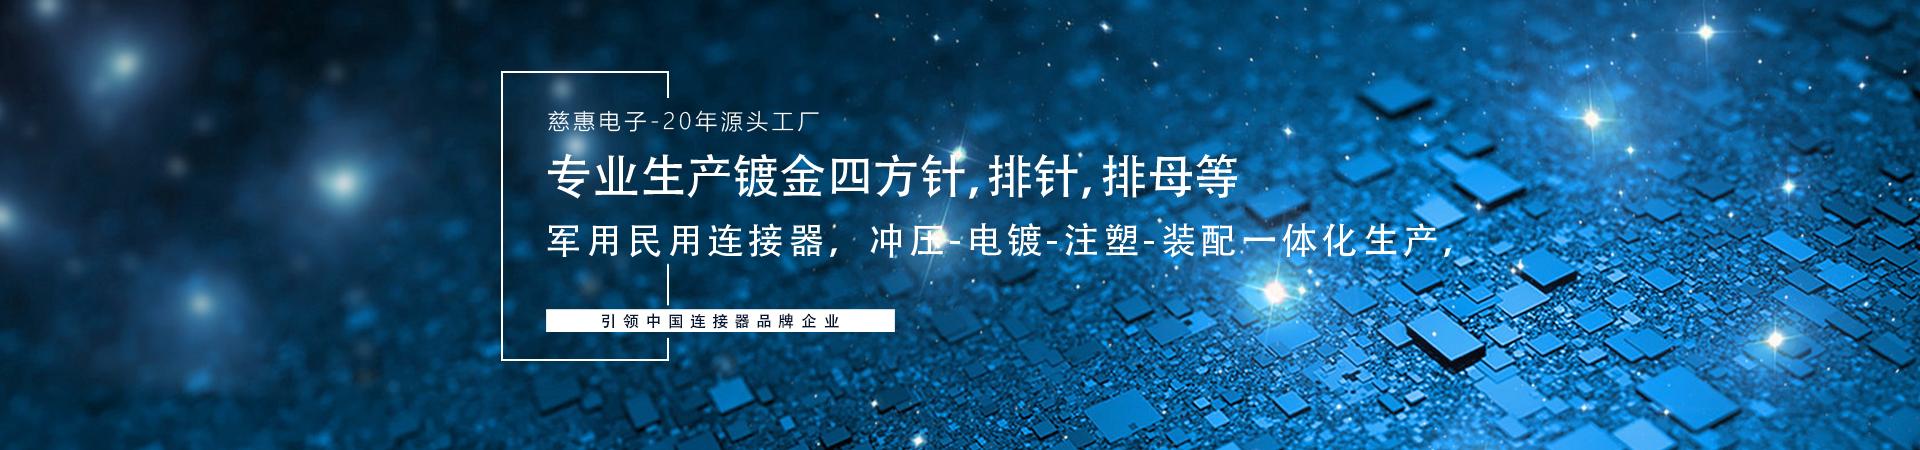 http://www.cncihui.com/data/upload/202010/20201030145437_122.jpg